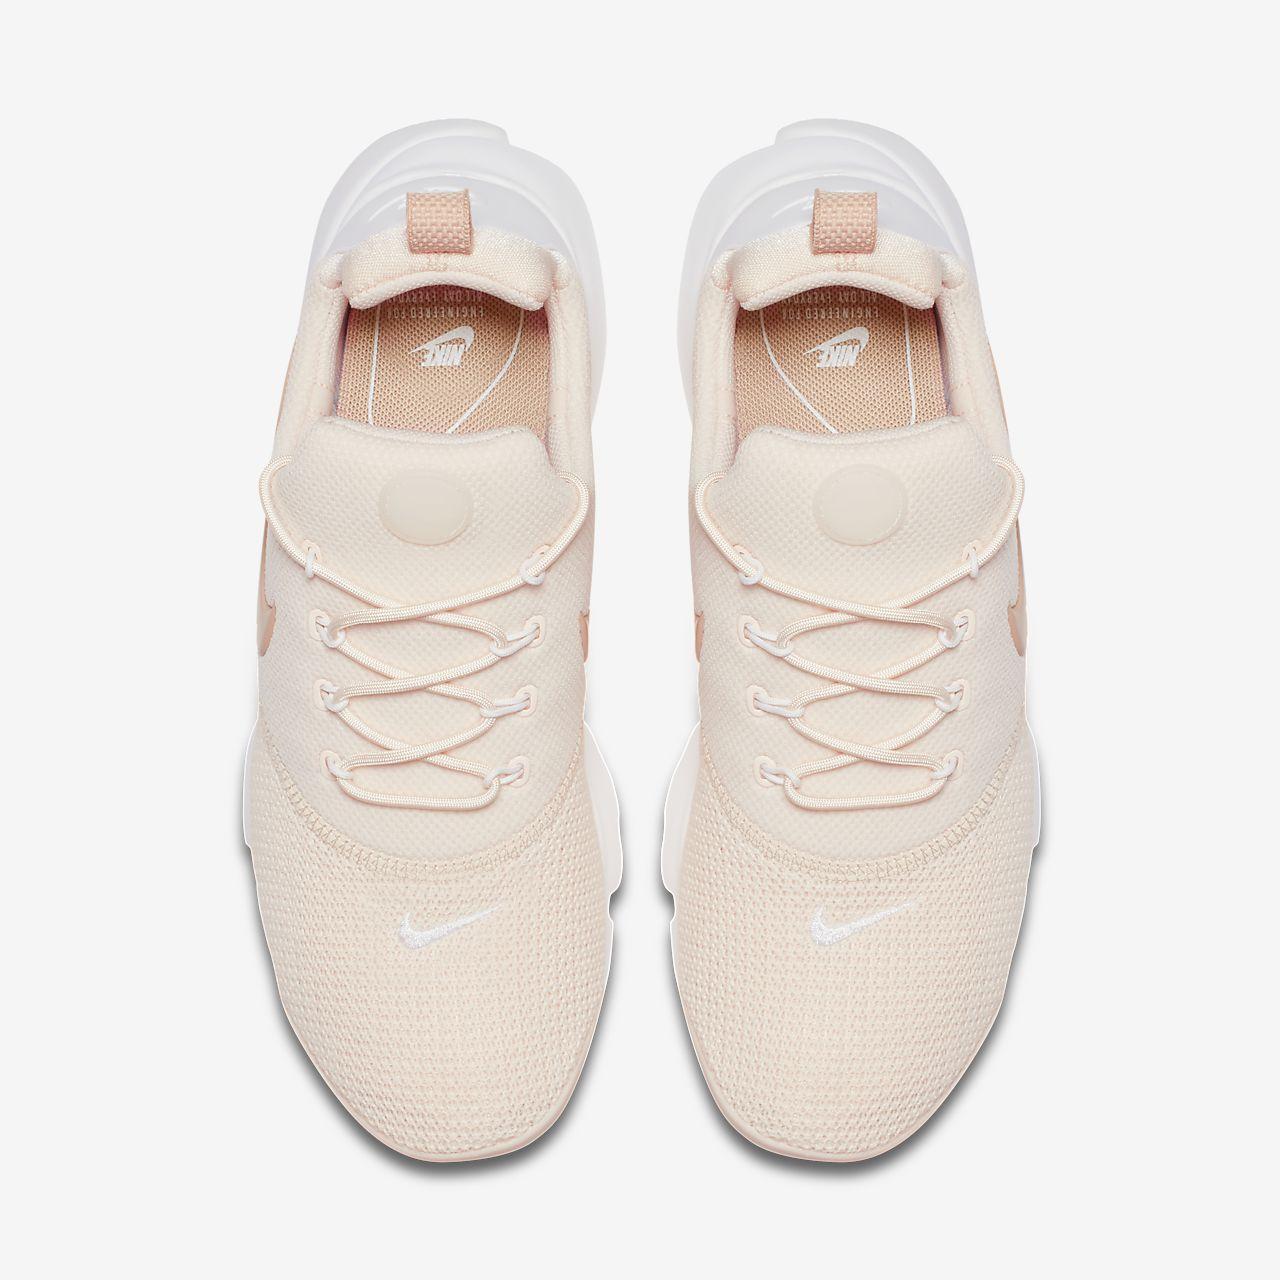 save off ac5bf fc3e0 scarpa nike presto fly guava icesummit whitebio beige 910569